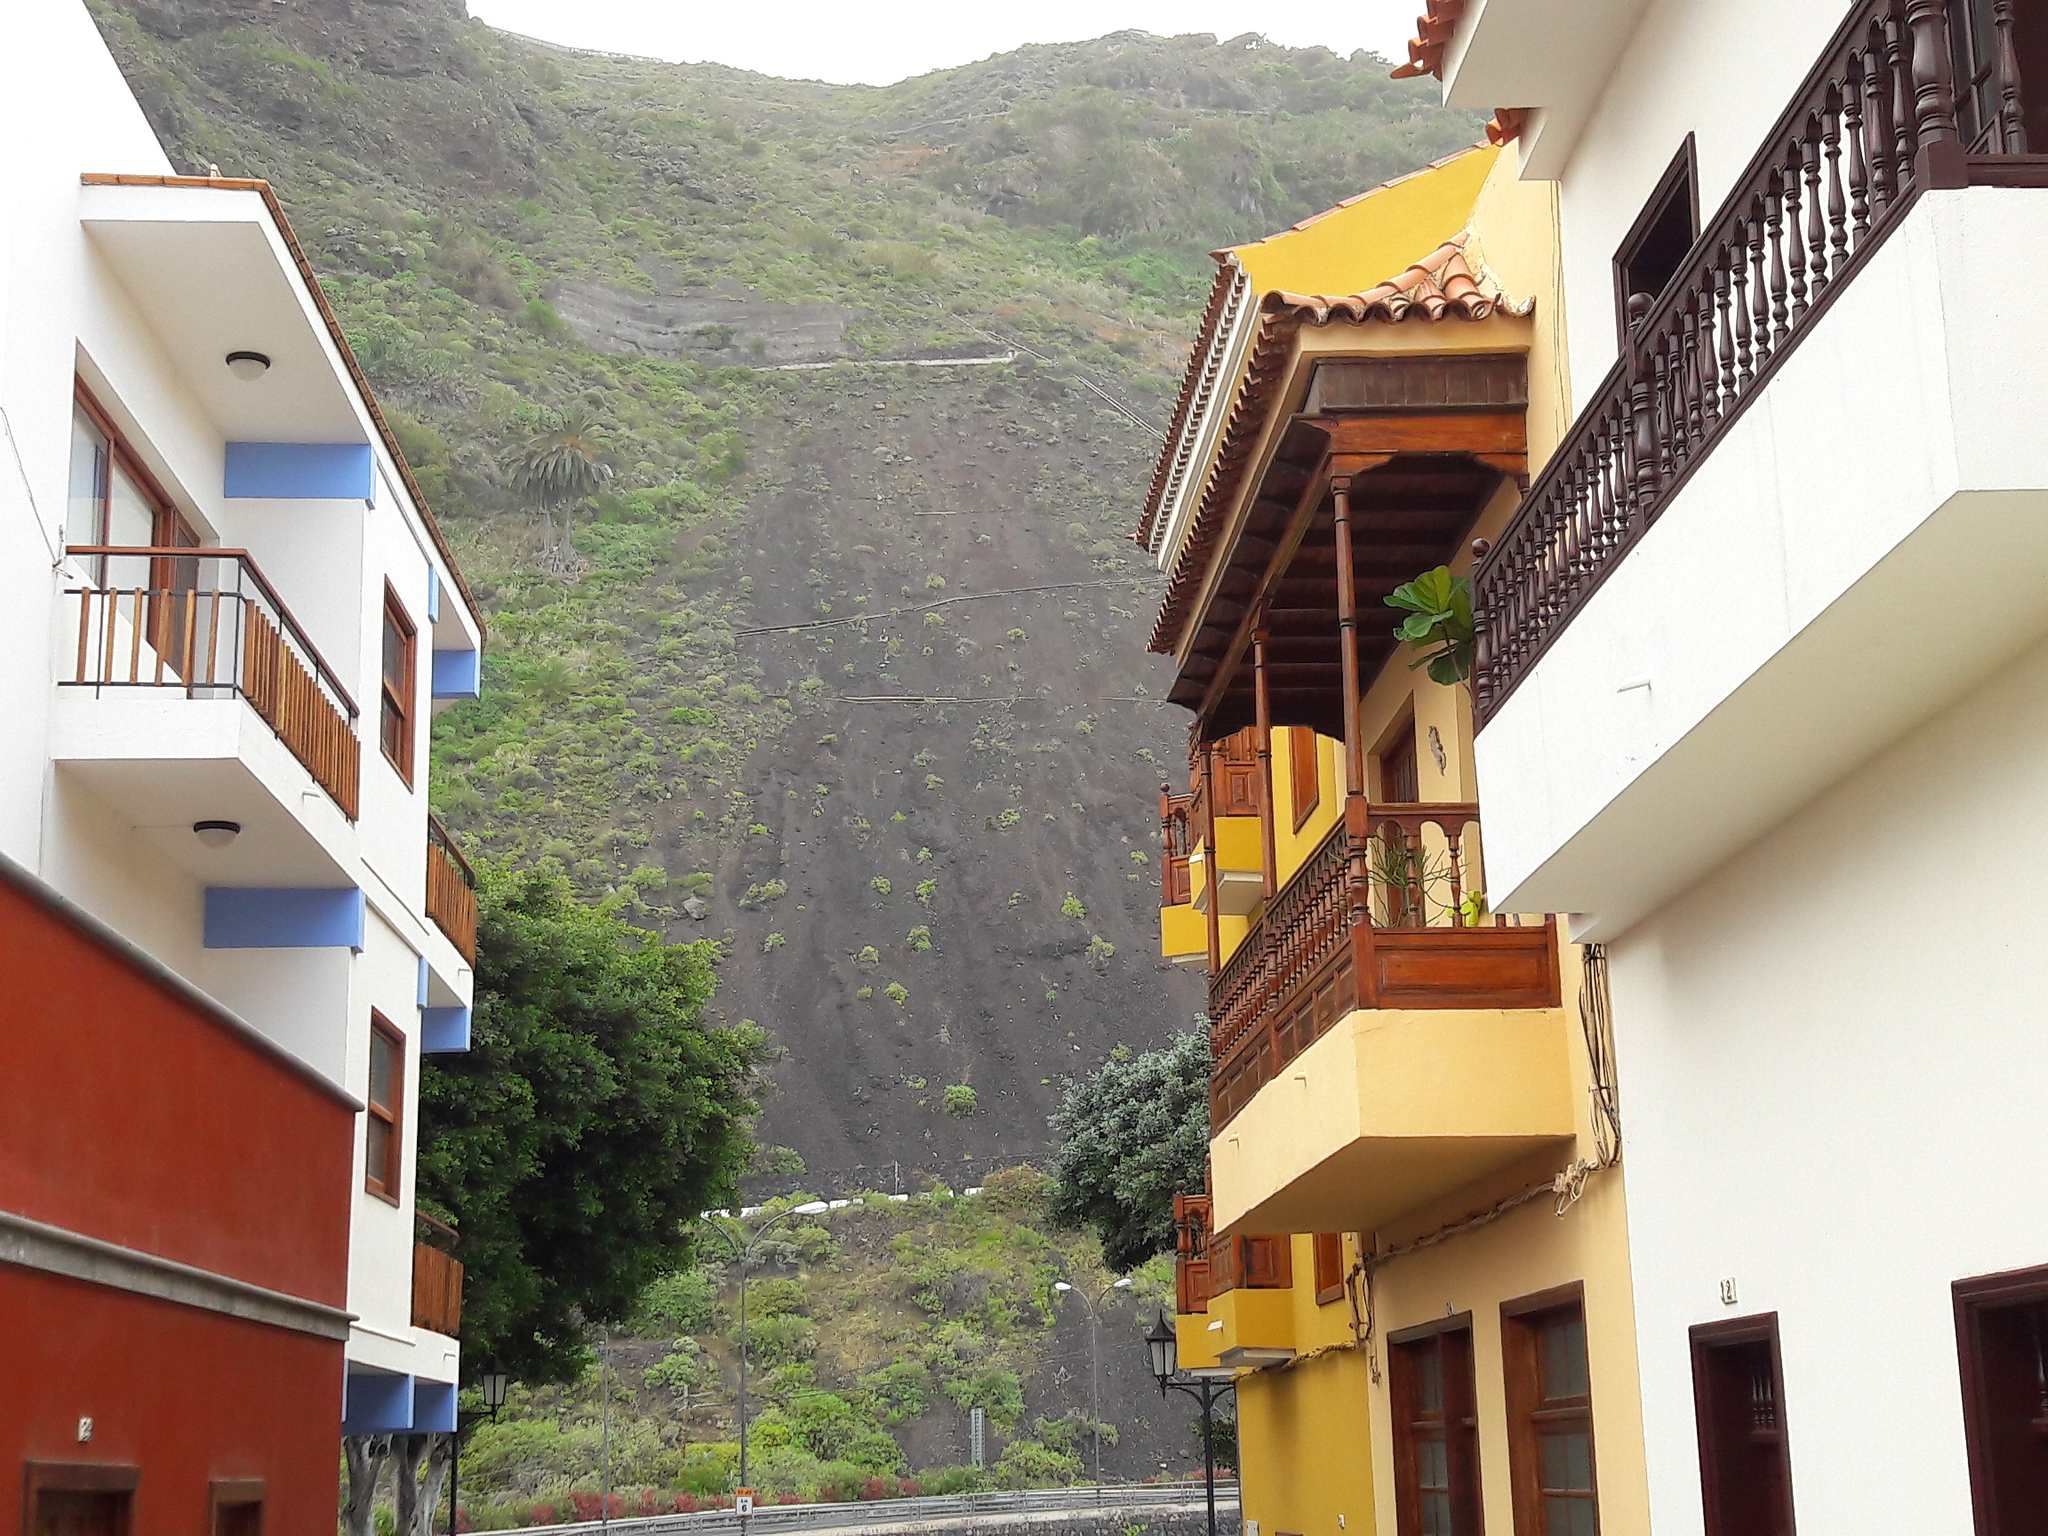 garachico